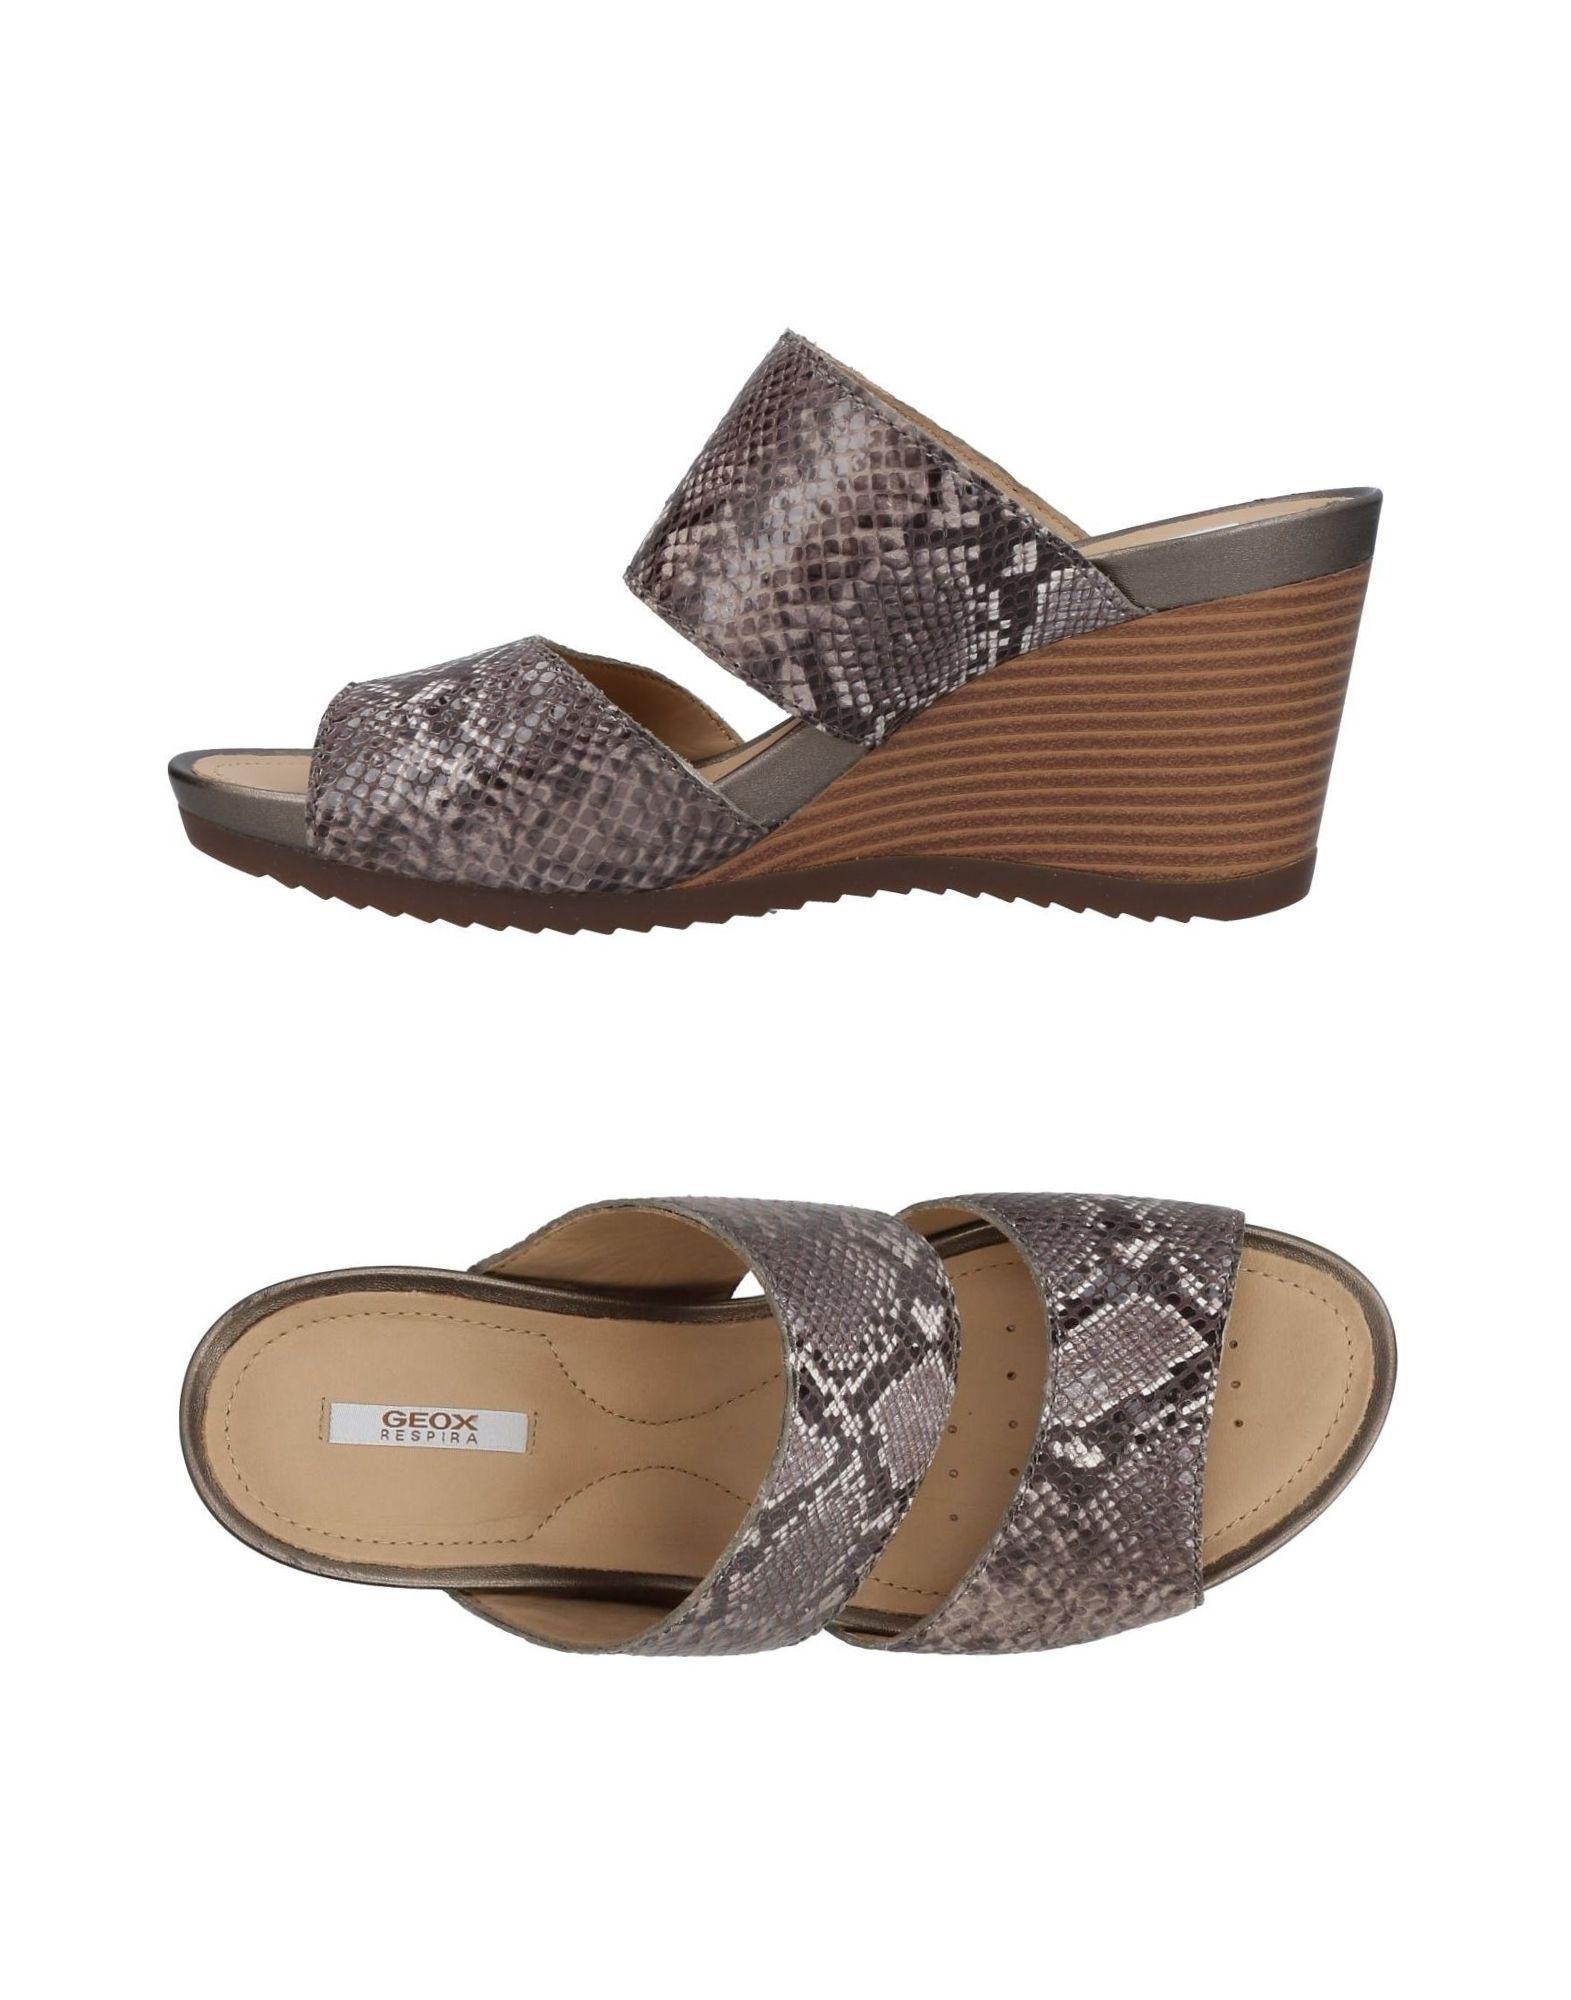 Geox Sandalen Damen  11414742GX Gute Qualität beliebte Schuhe